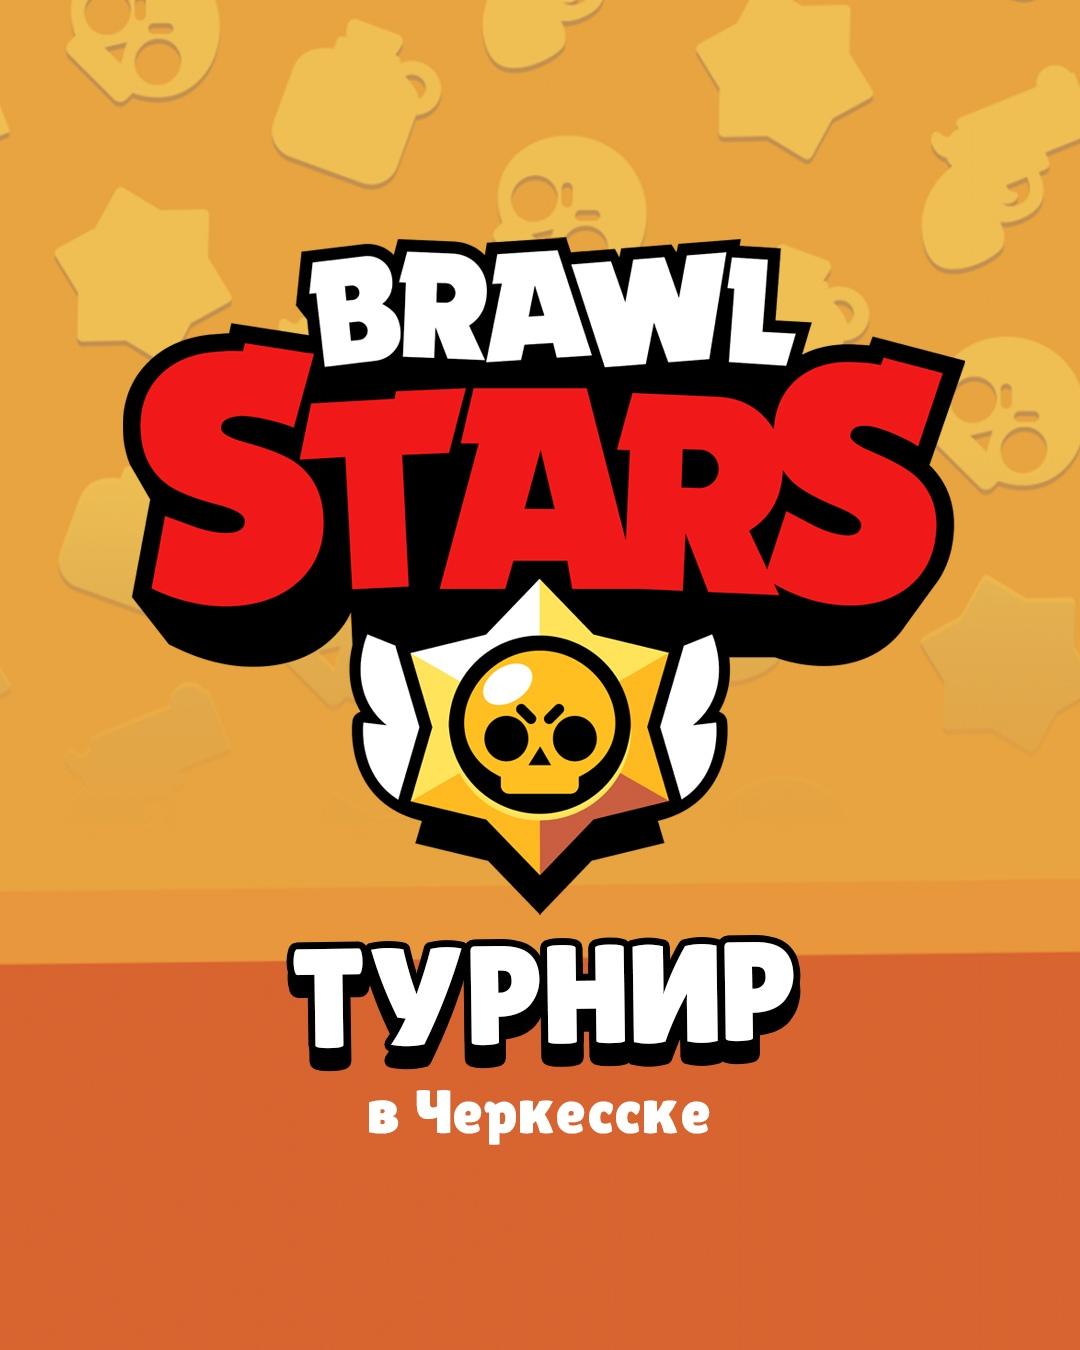 Первый открытый кибер турнир Черкесска по Brawl Stars!